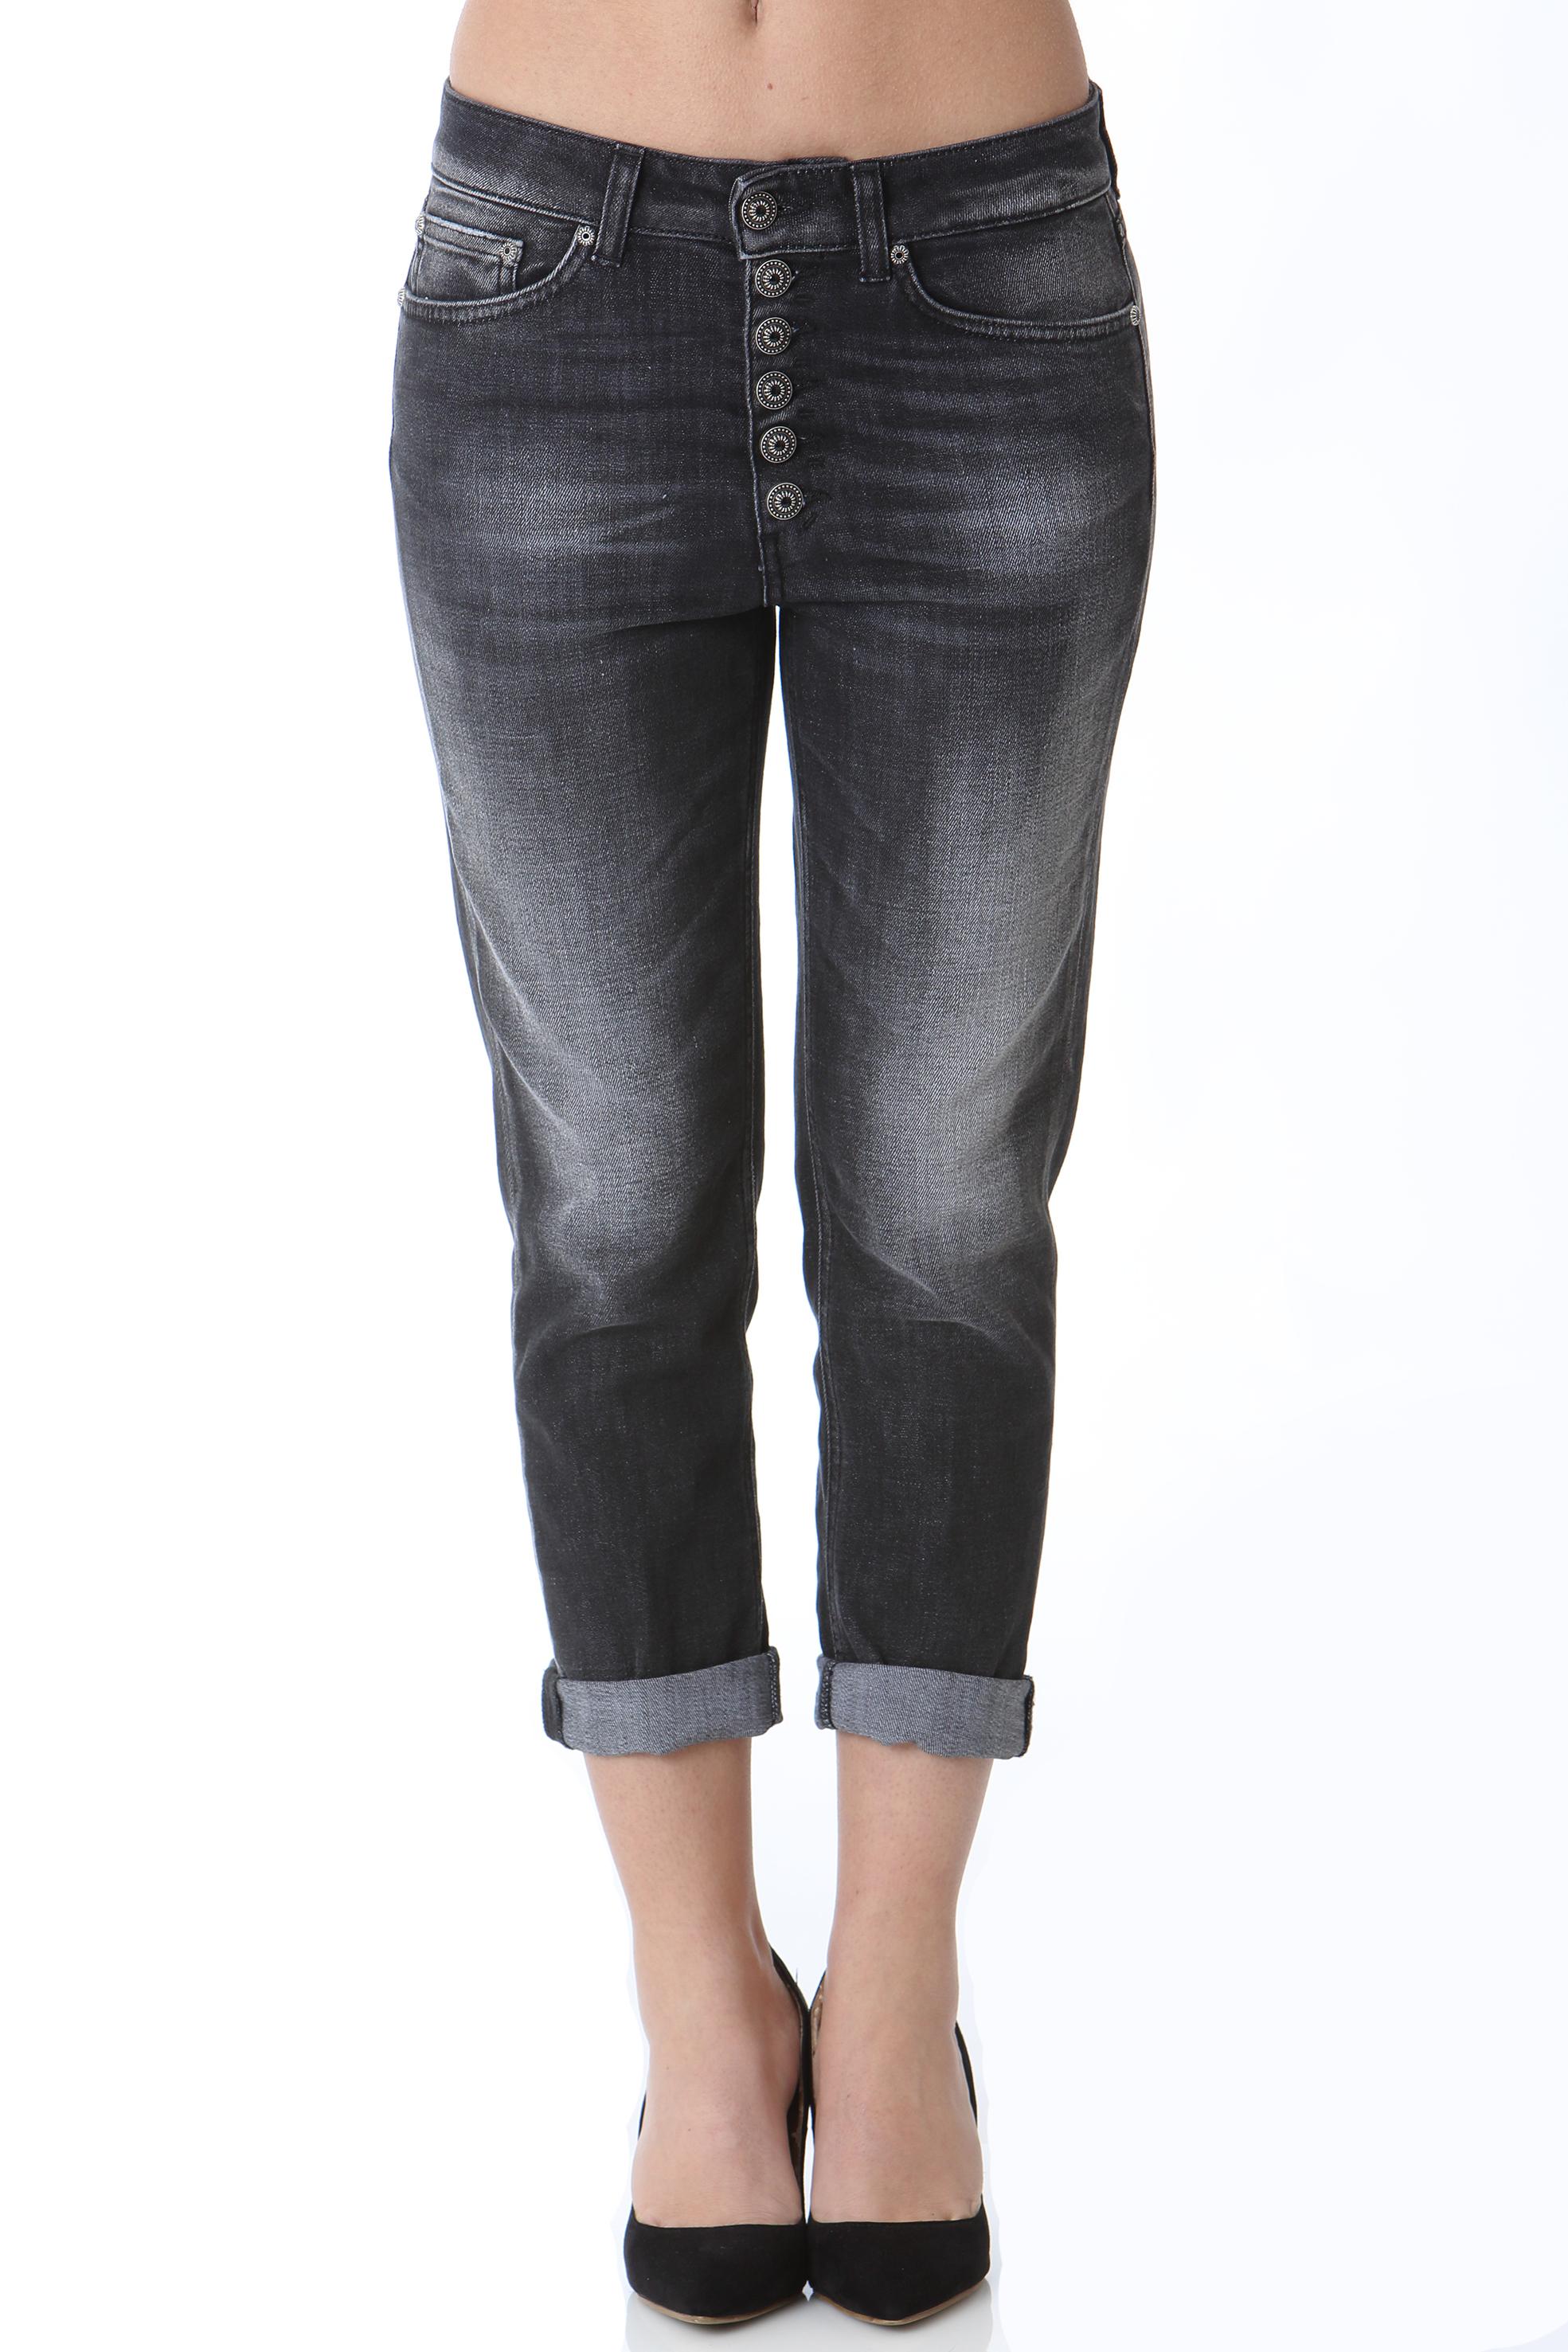 KOONS GIOIELLO DON DUP | Jeans | DP268BDS0272BC7-999-KOONS GIOIELLO999